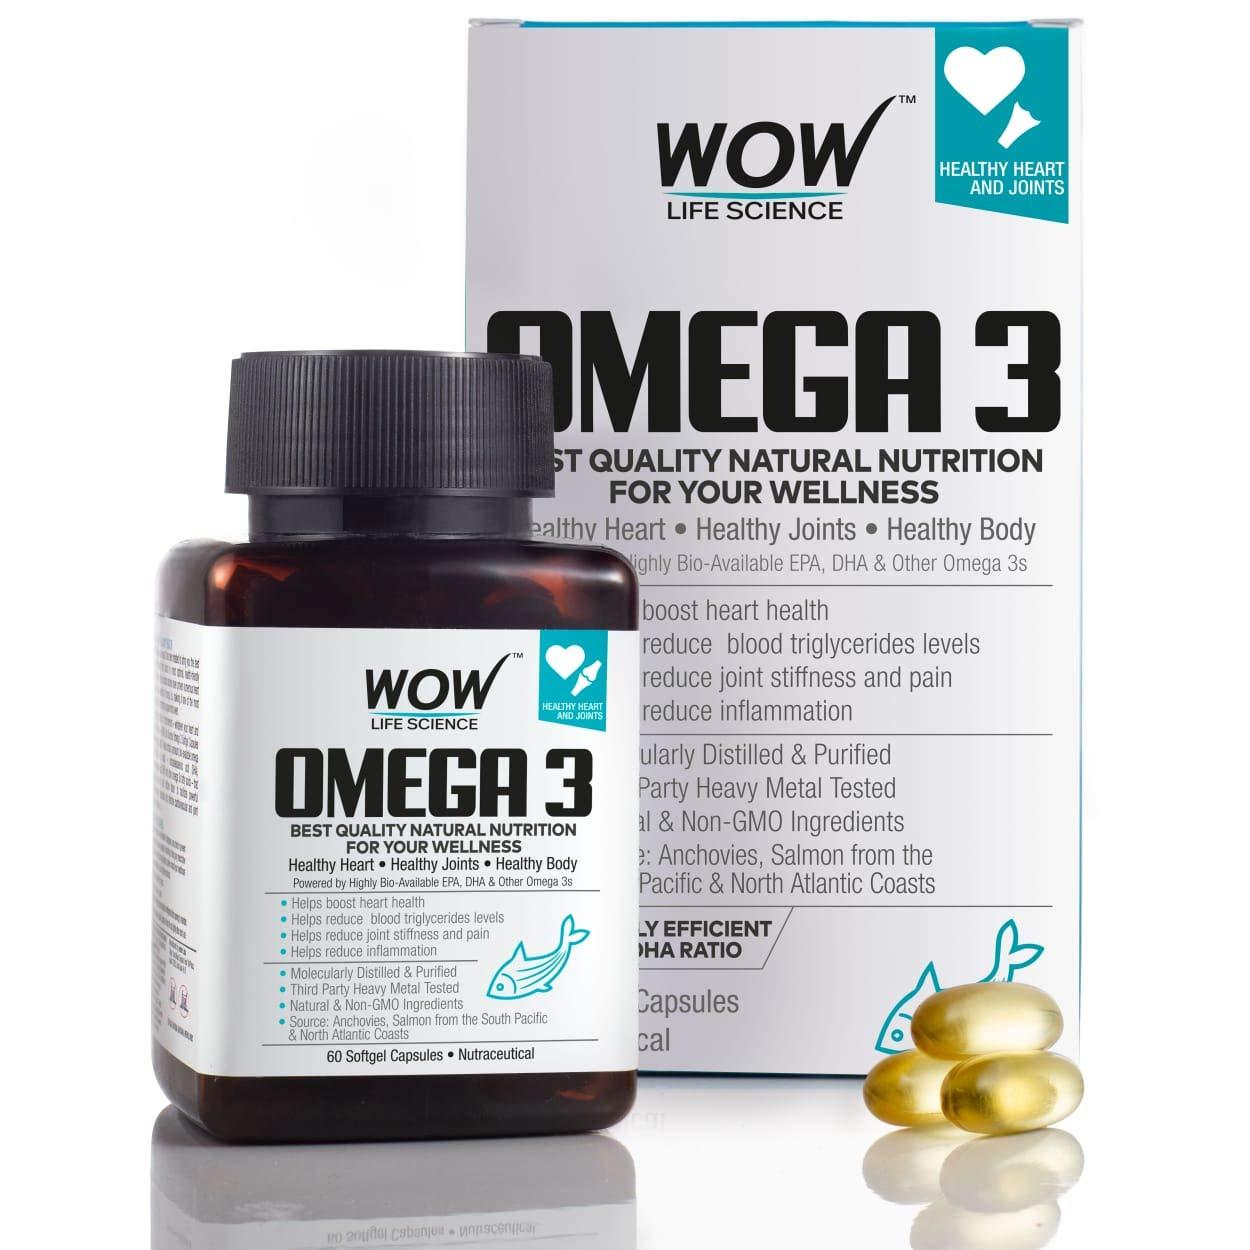 WOW Omega-3 Fish Oil Triple Strength 1000mg (550mg EPA, 350mg DHA, 100mg Other Omega 3 Fatty Acids) - 60 Capsules product image